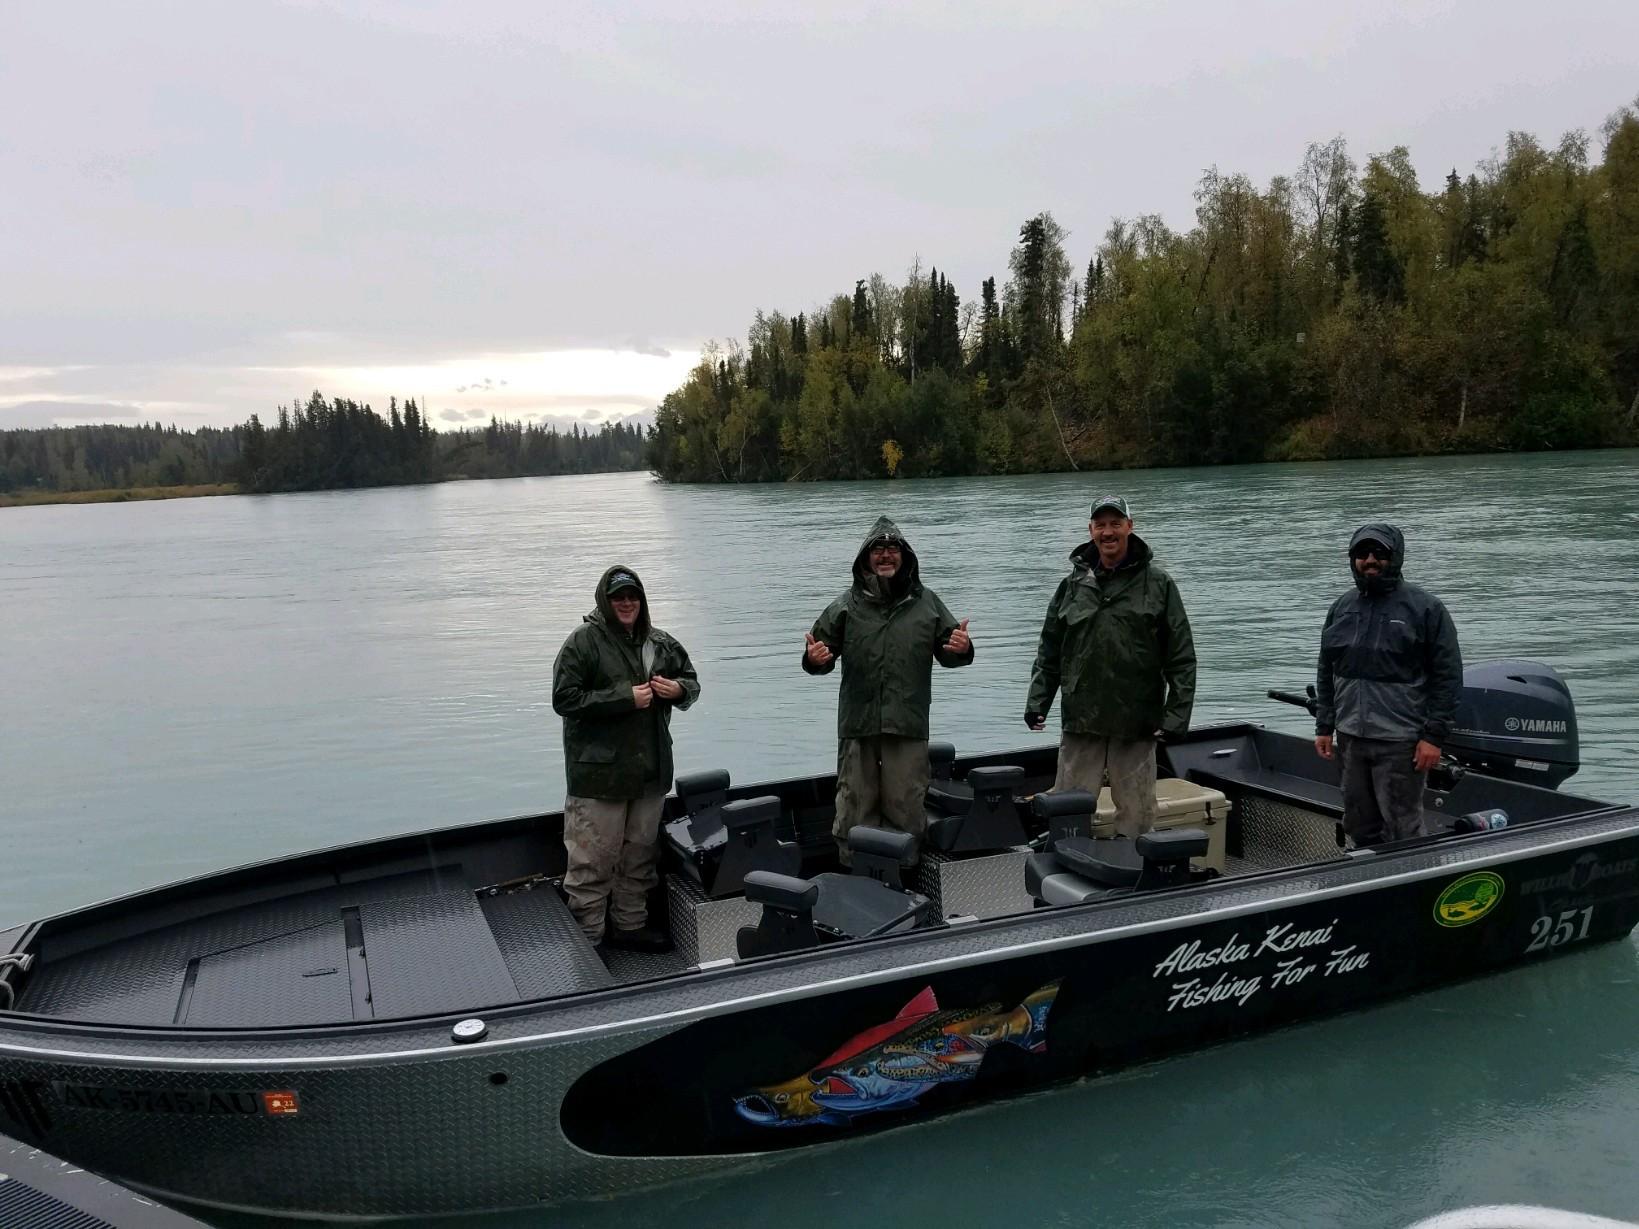 Full Day Float Fishing Trip